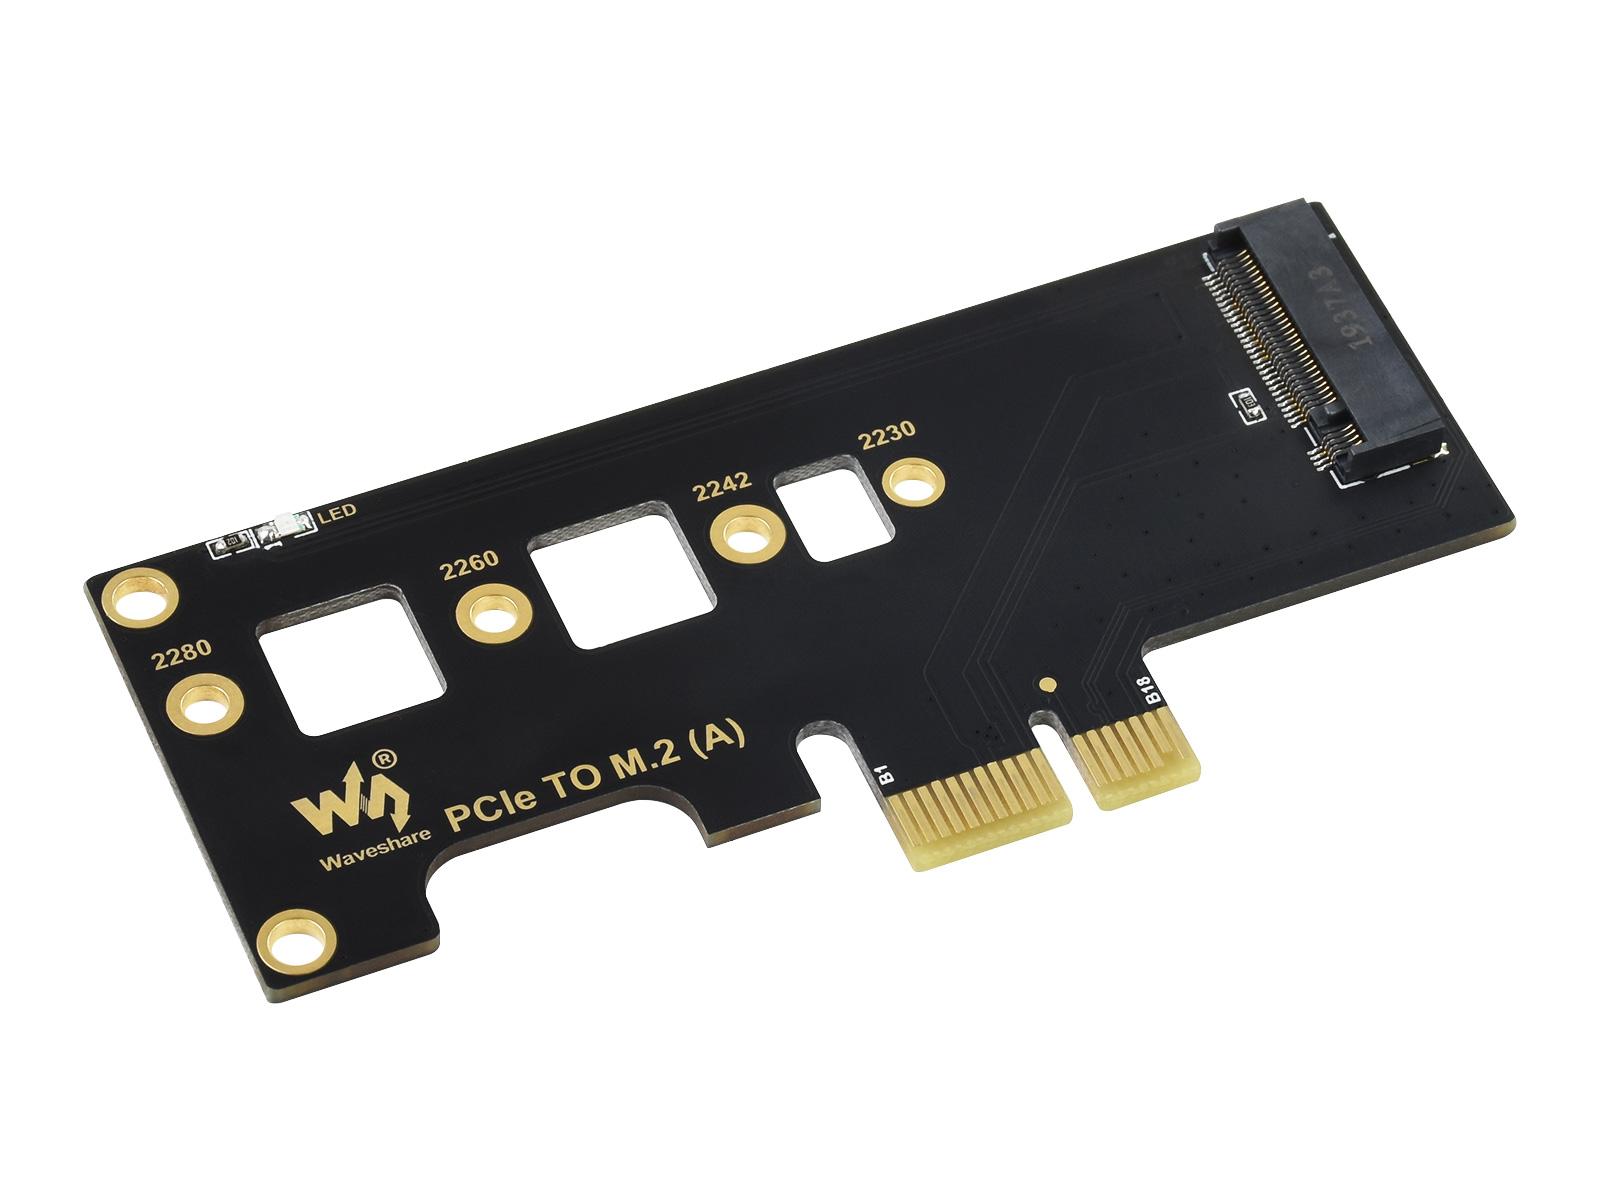 PCI-E转M.2转接卡 升级硬盘SSD固态硬盘卡 支持CM4